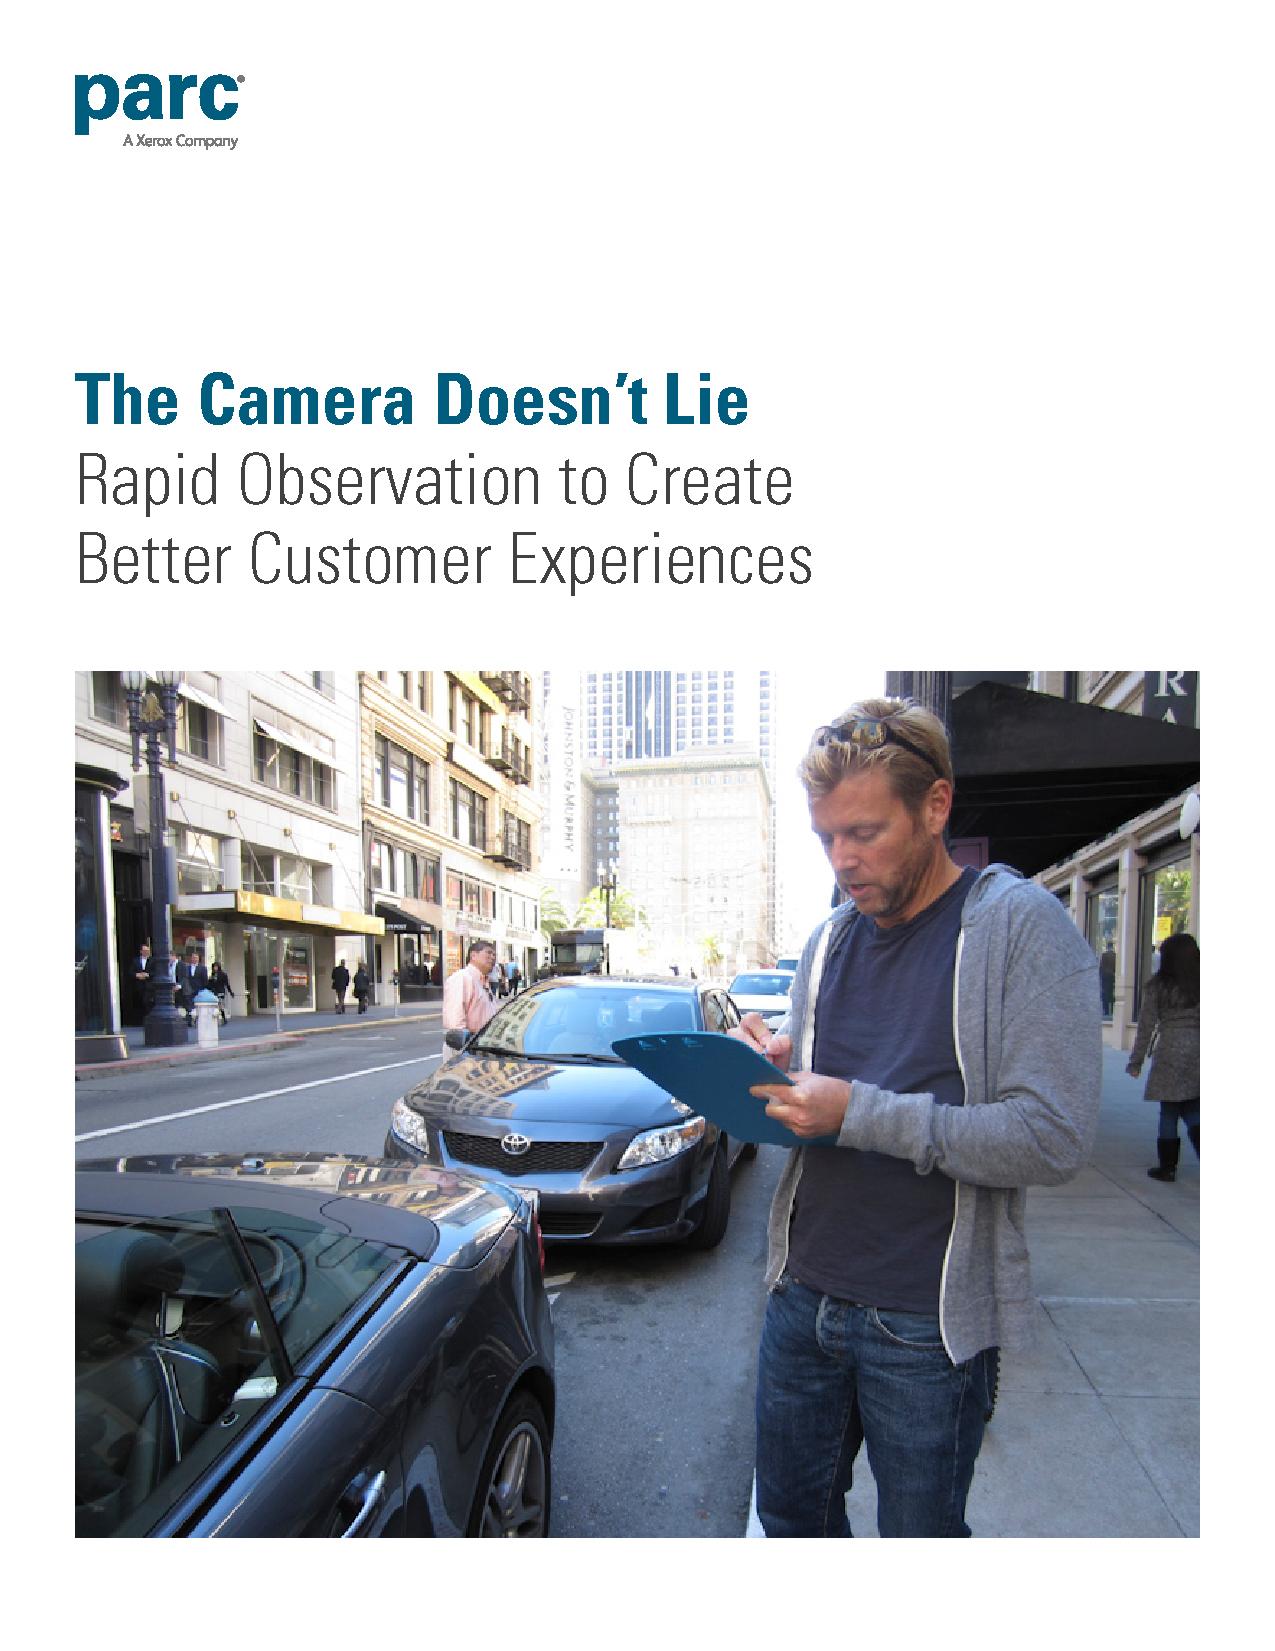 the_camera-doesnt_lie_FINAL_parc1